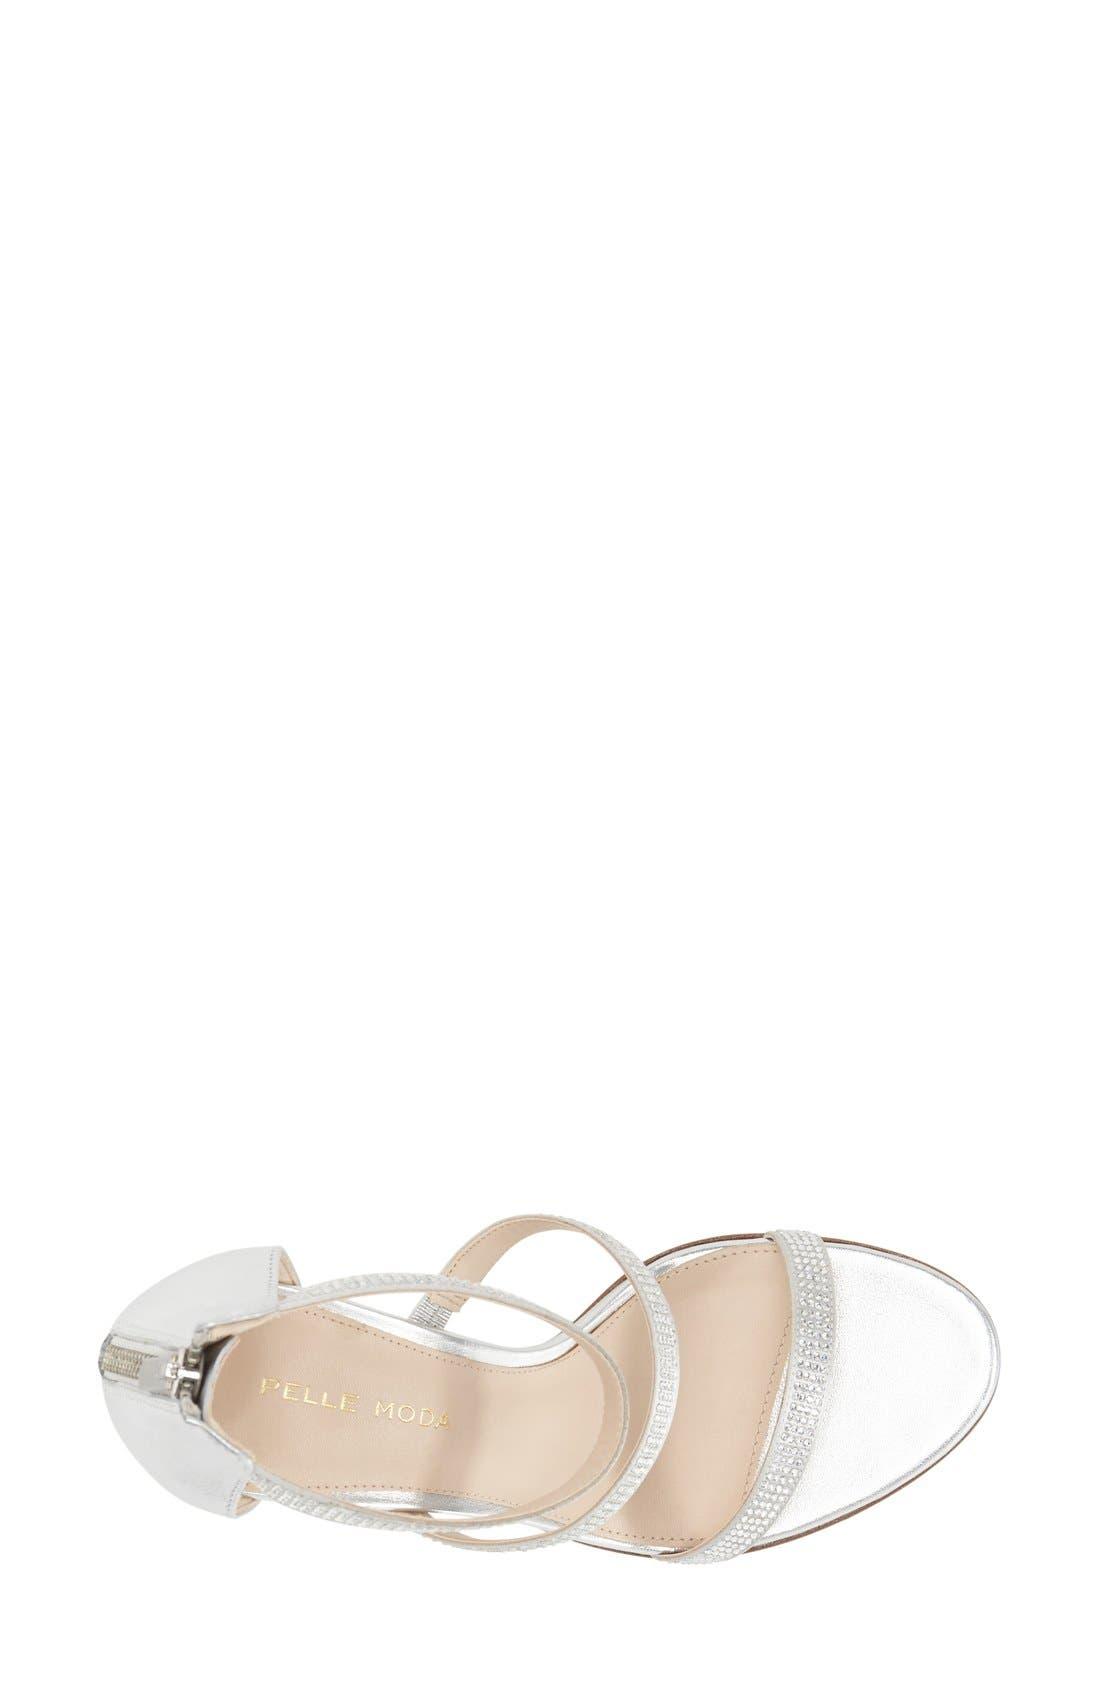 Alternate Image 3  - Pelle Moda 'Dalia' Three Strap Sandal (Women)